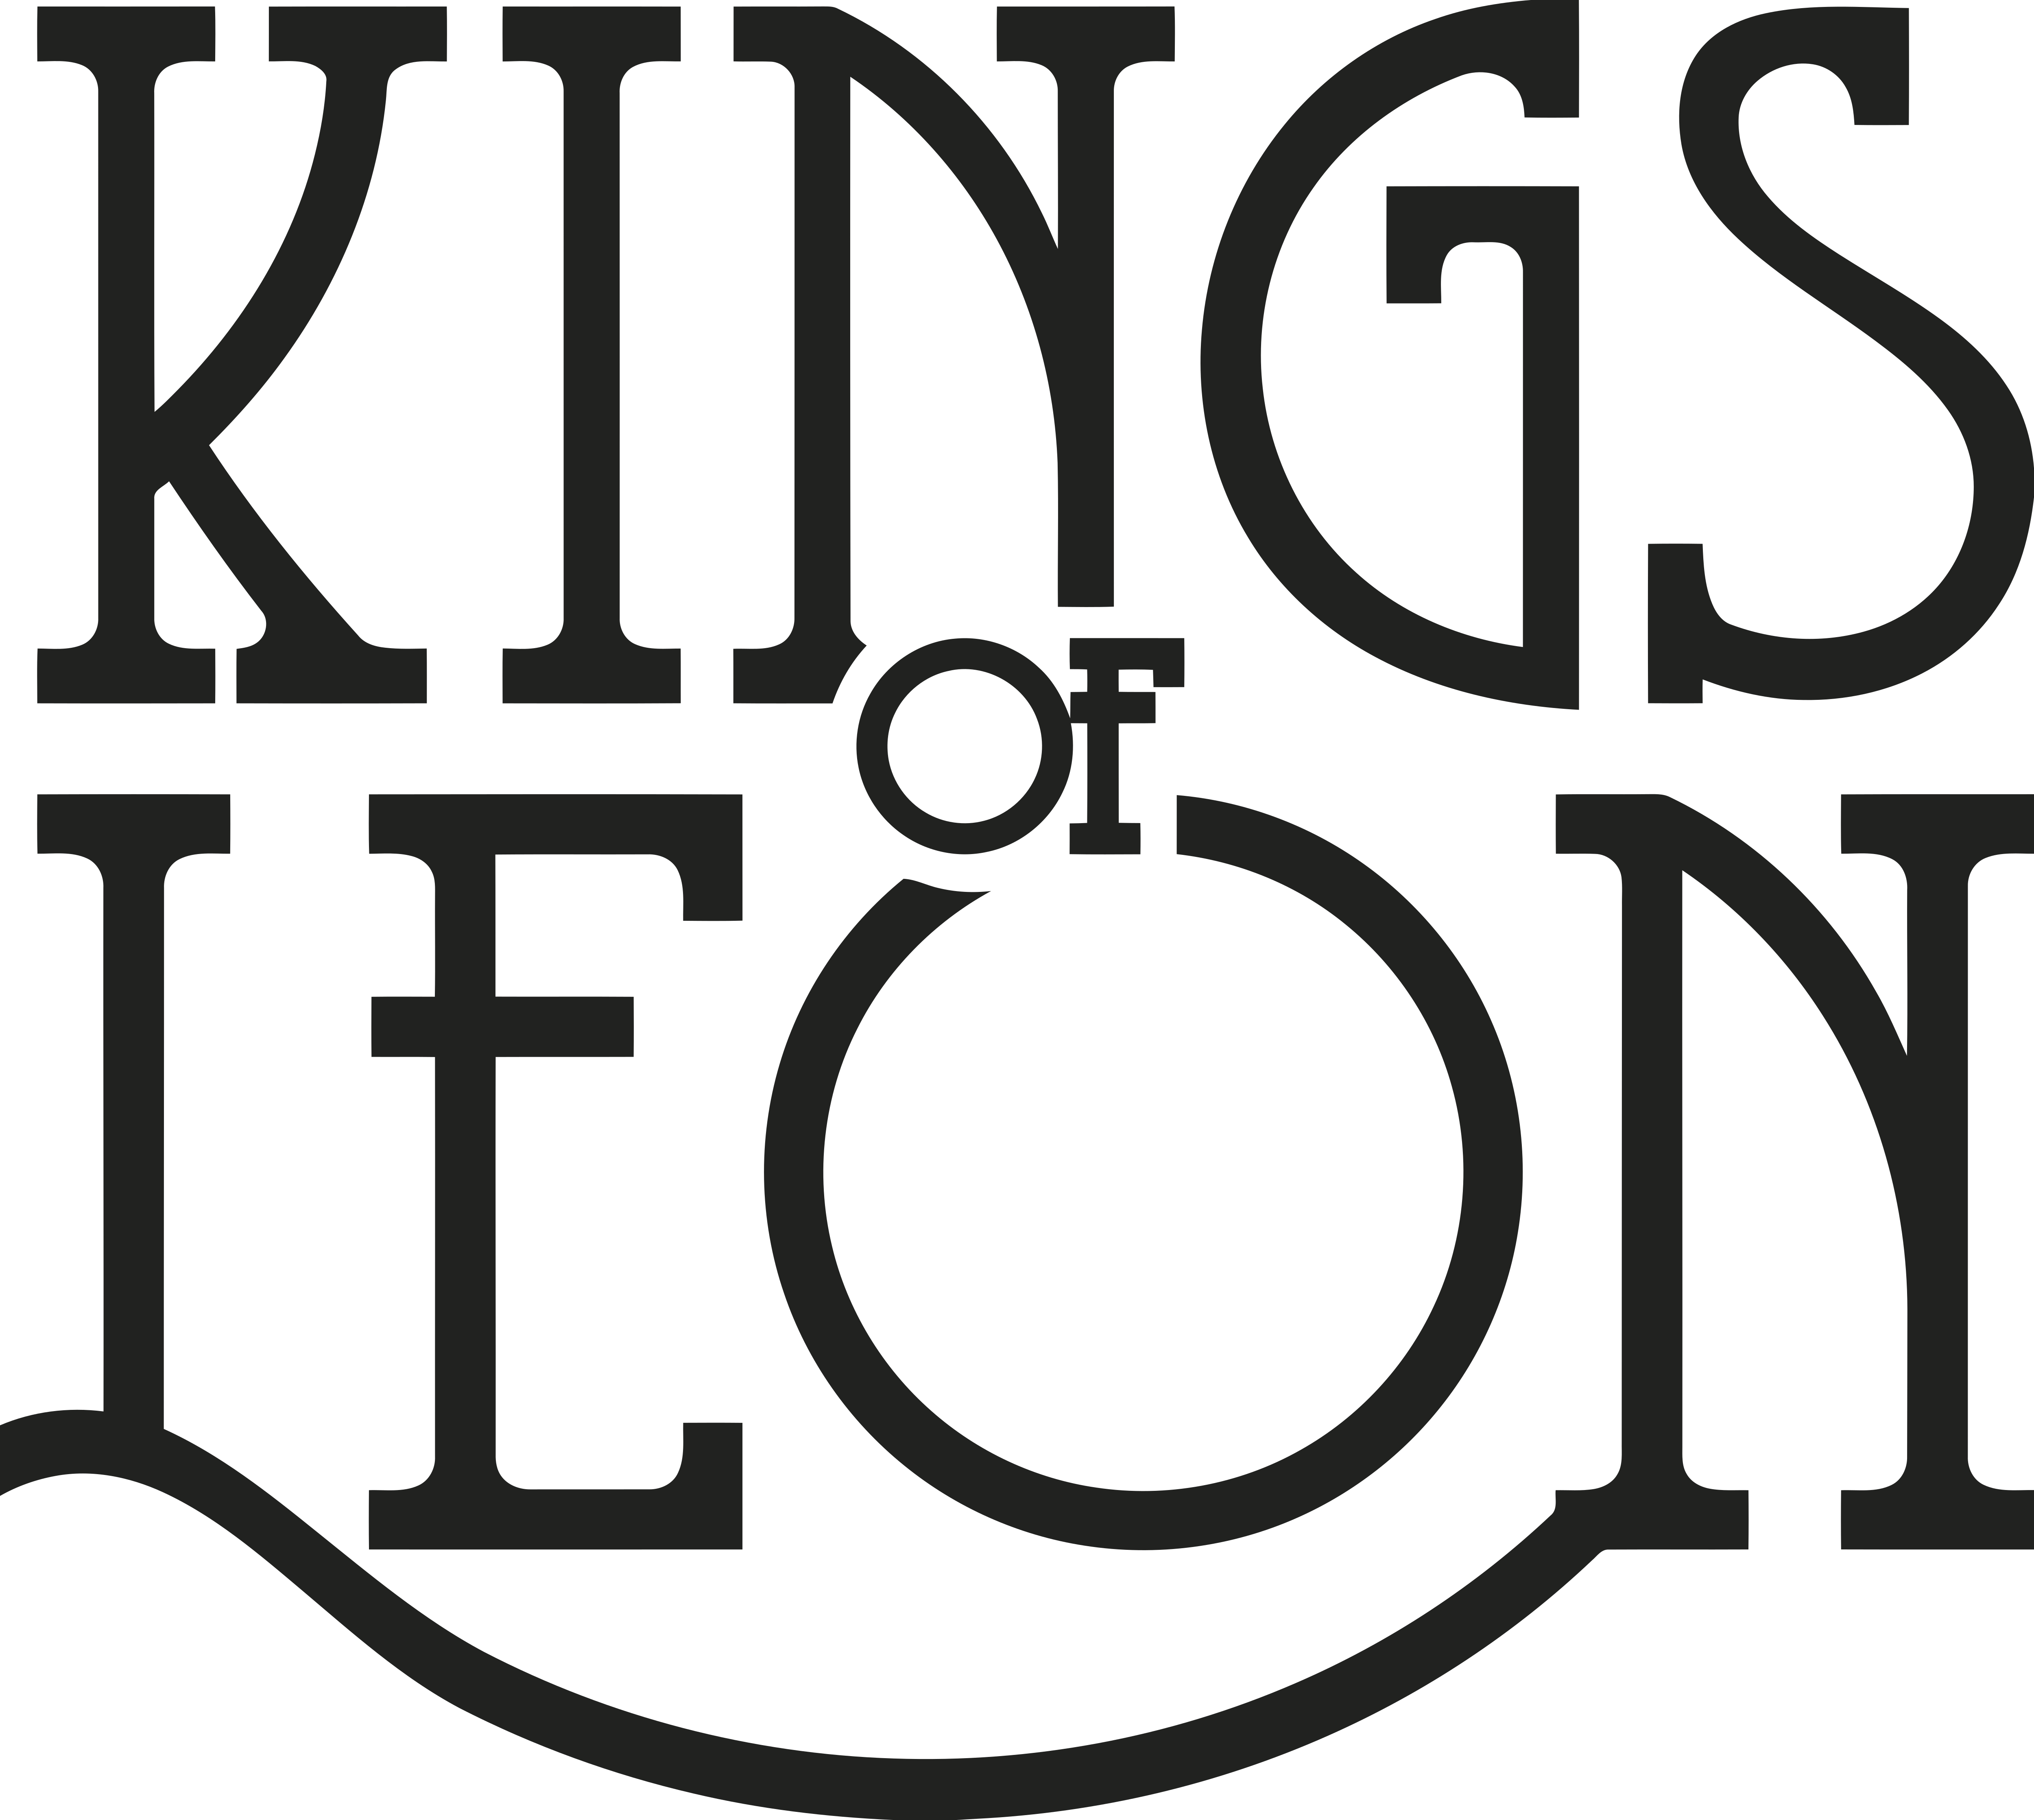 Kings of Leon – Logos Download